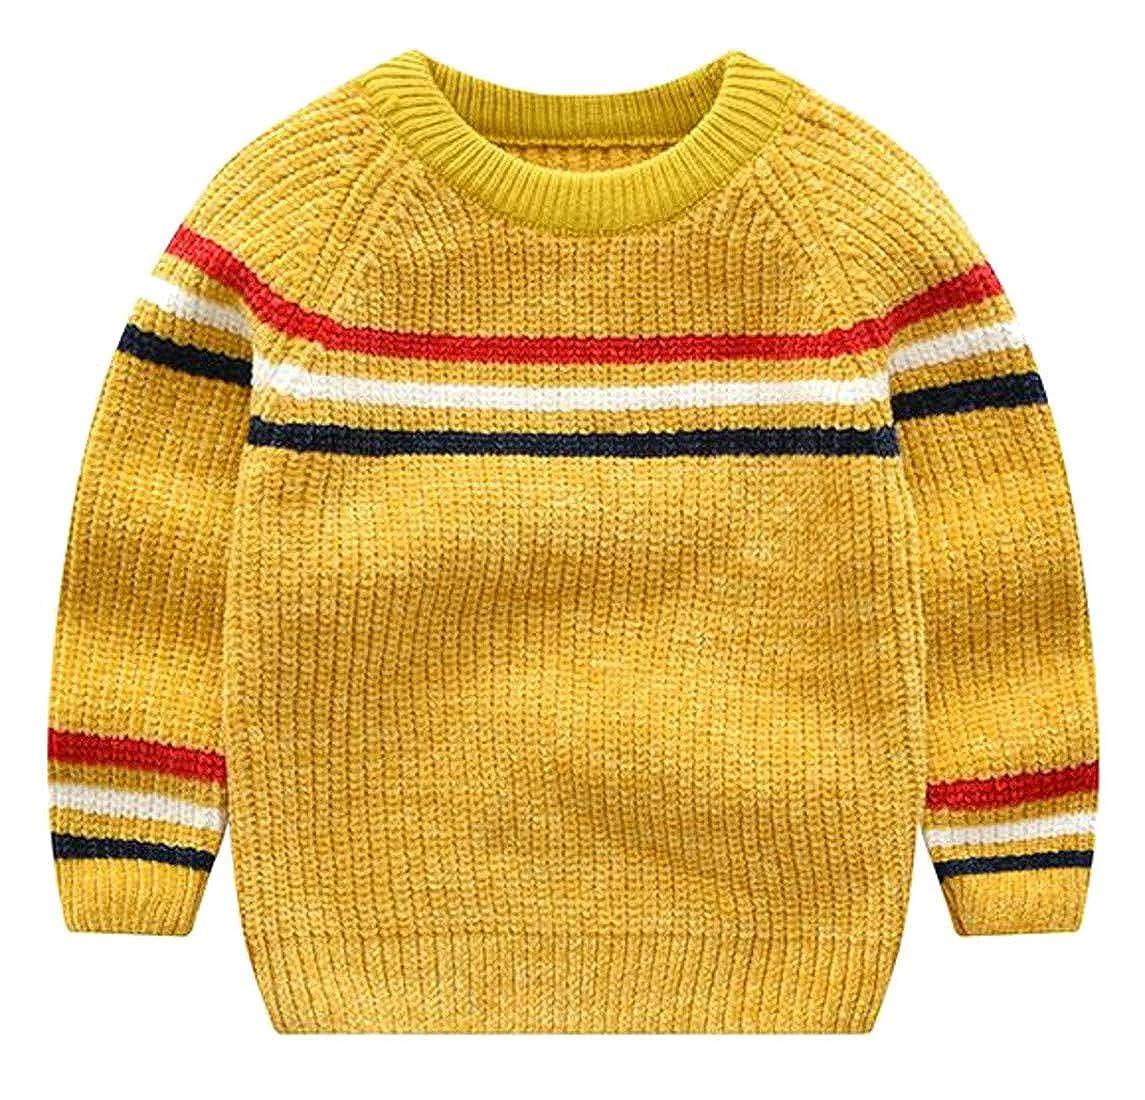 1754812368a8 Amazon.com  Wofupowga Boys Striped Loose Knitted Raglan Sleeve ...